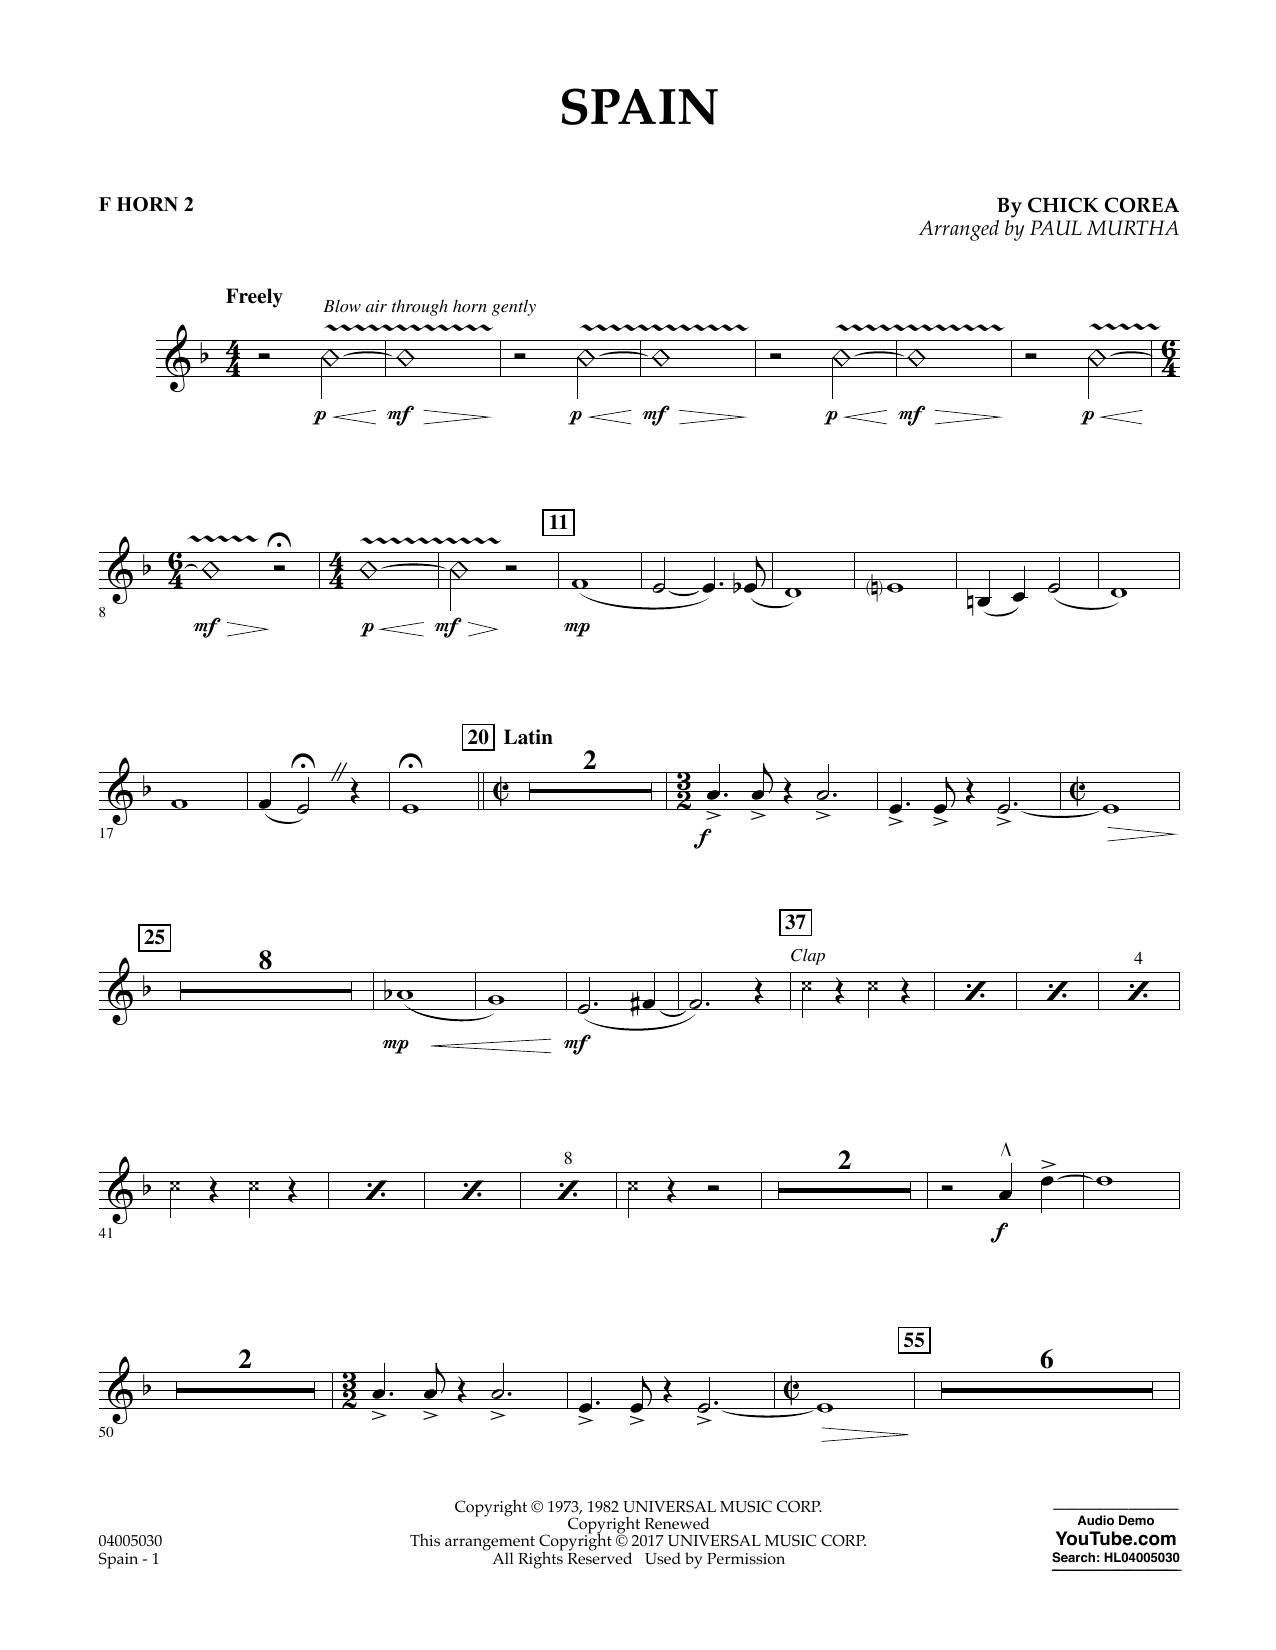 Spain - F Horn 2 Sheet Music